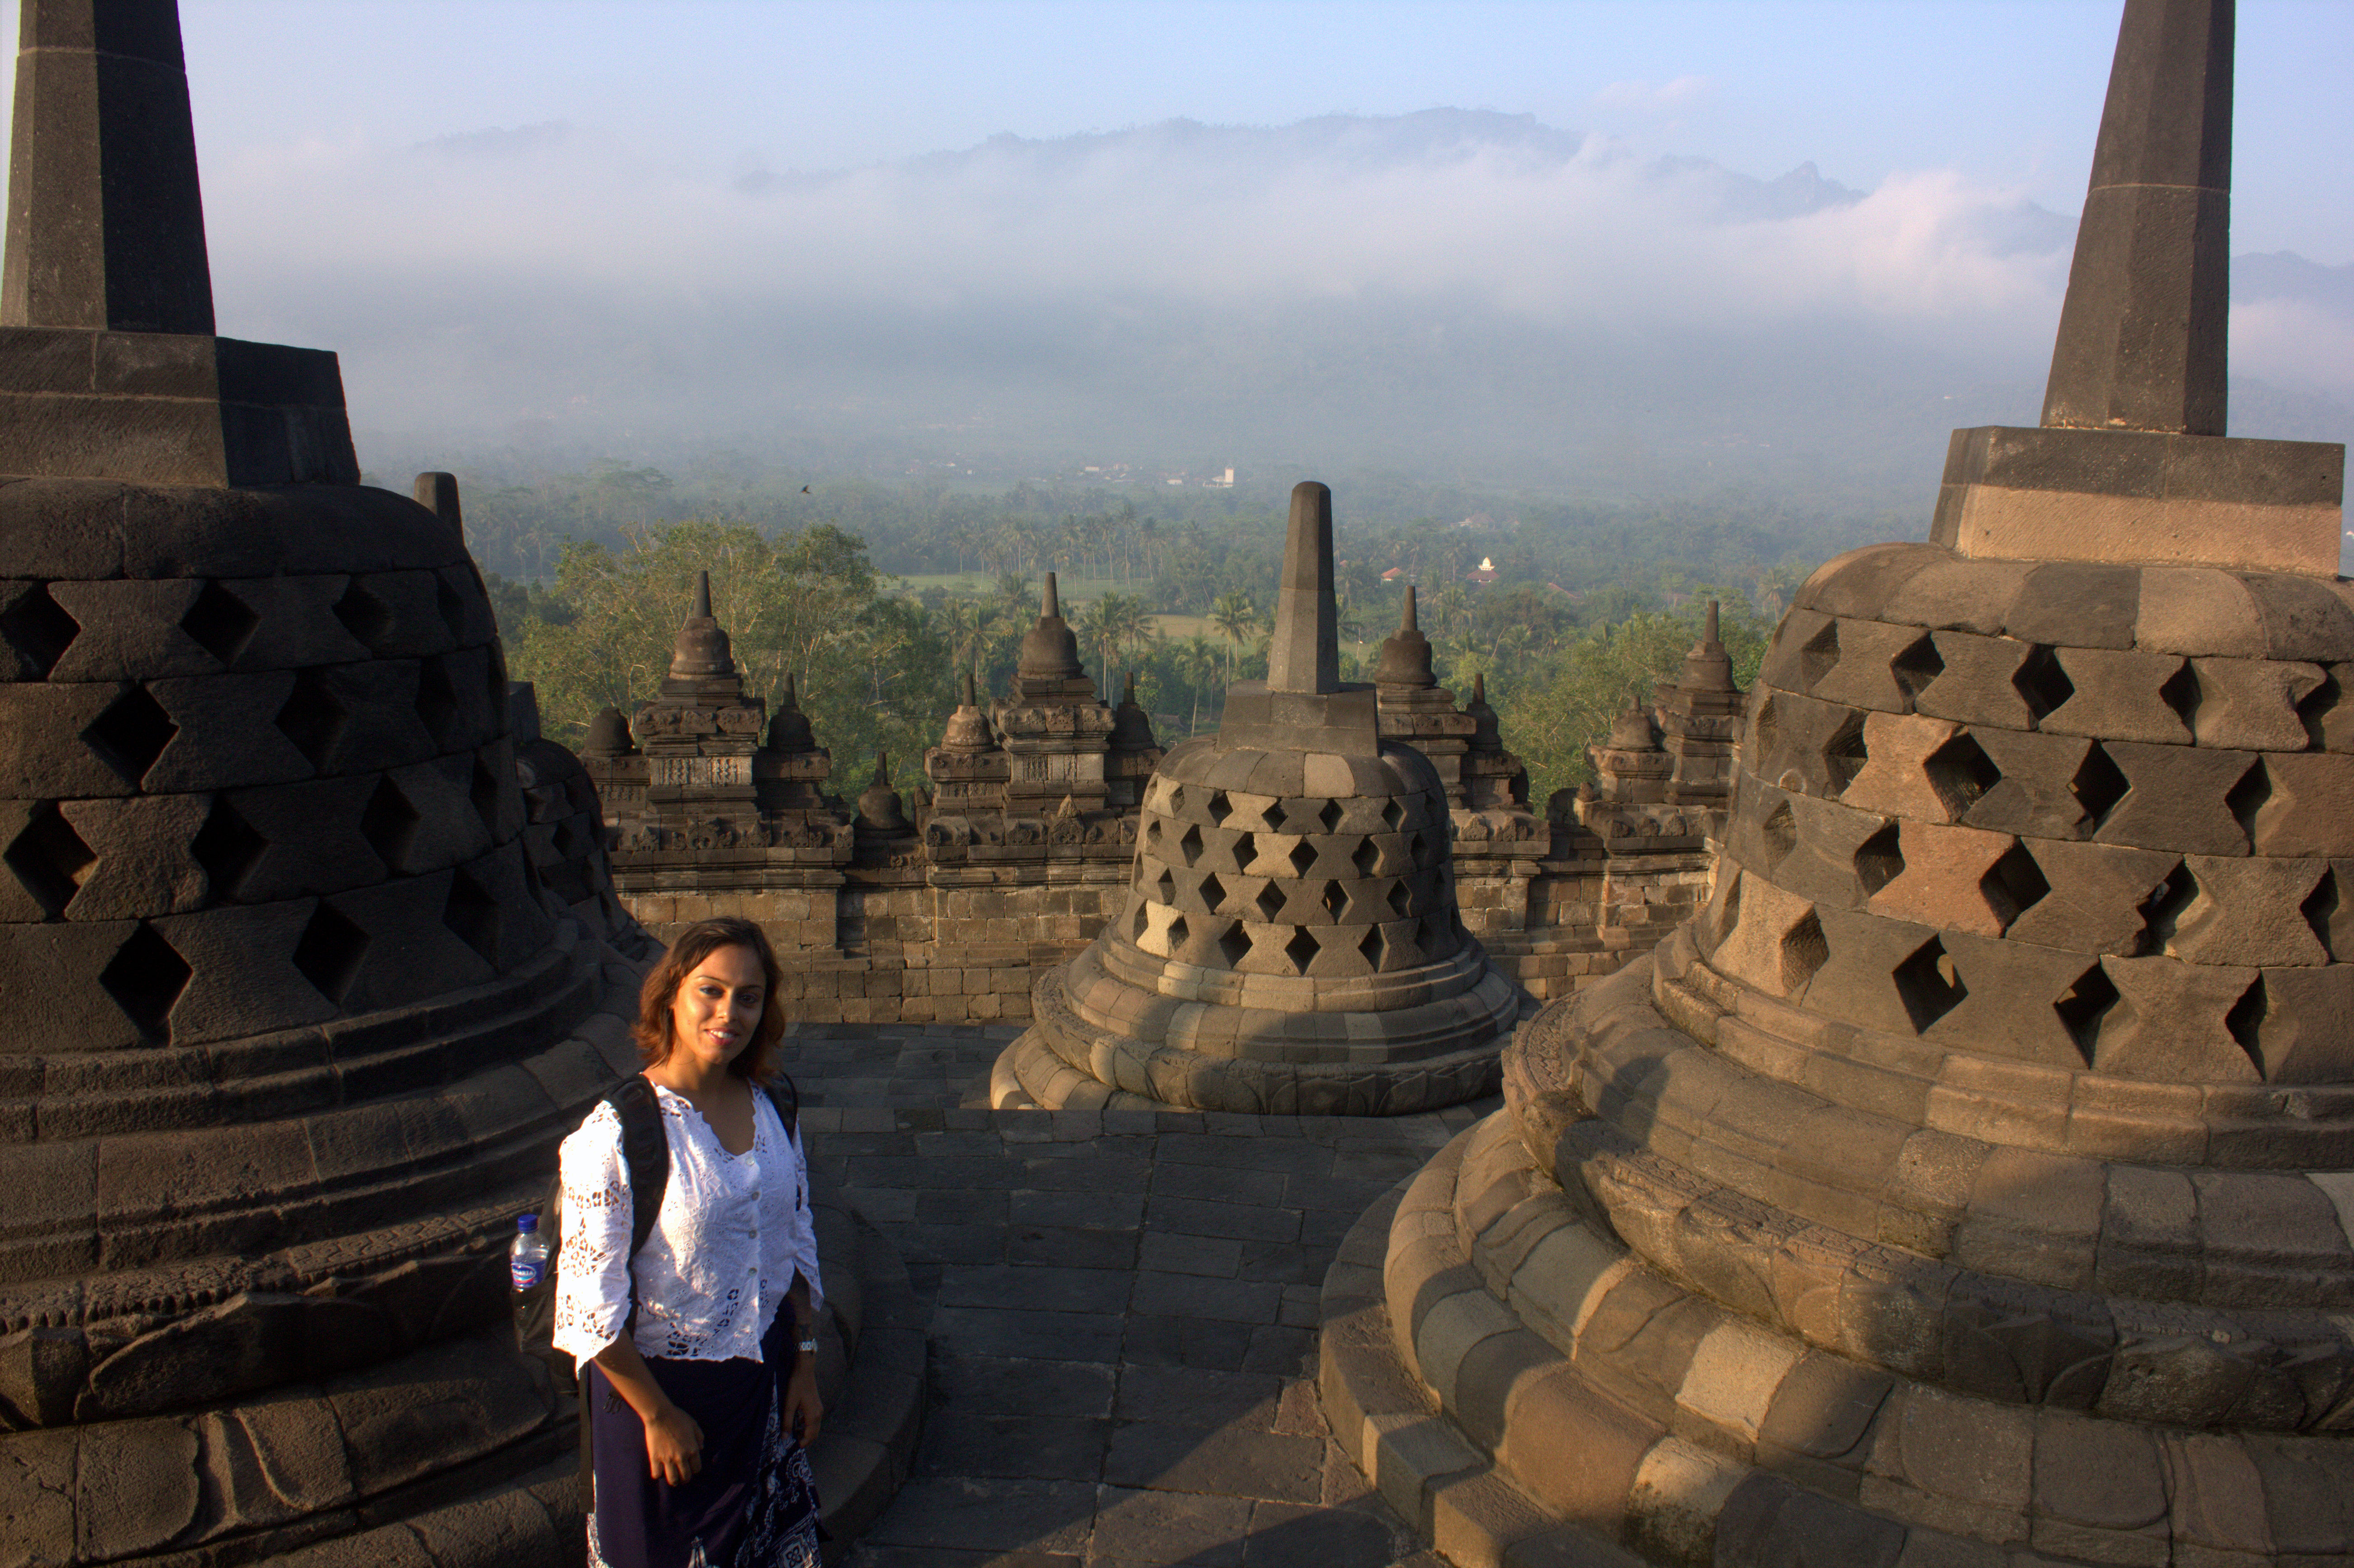 We had Borobudur on our minds